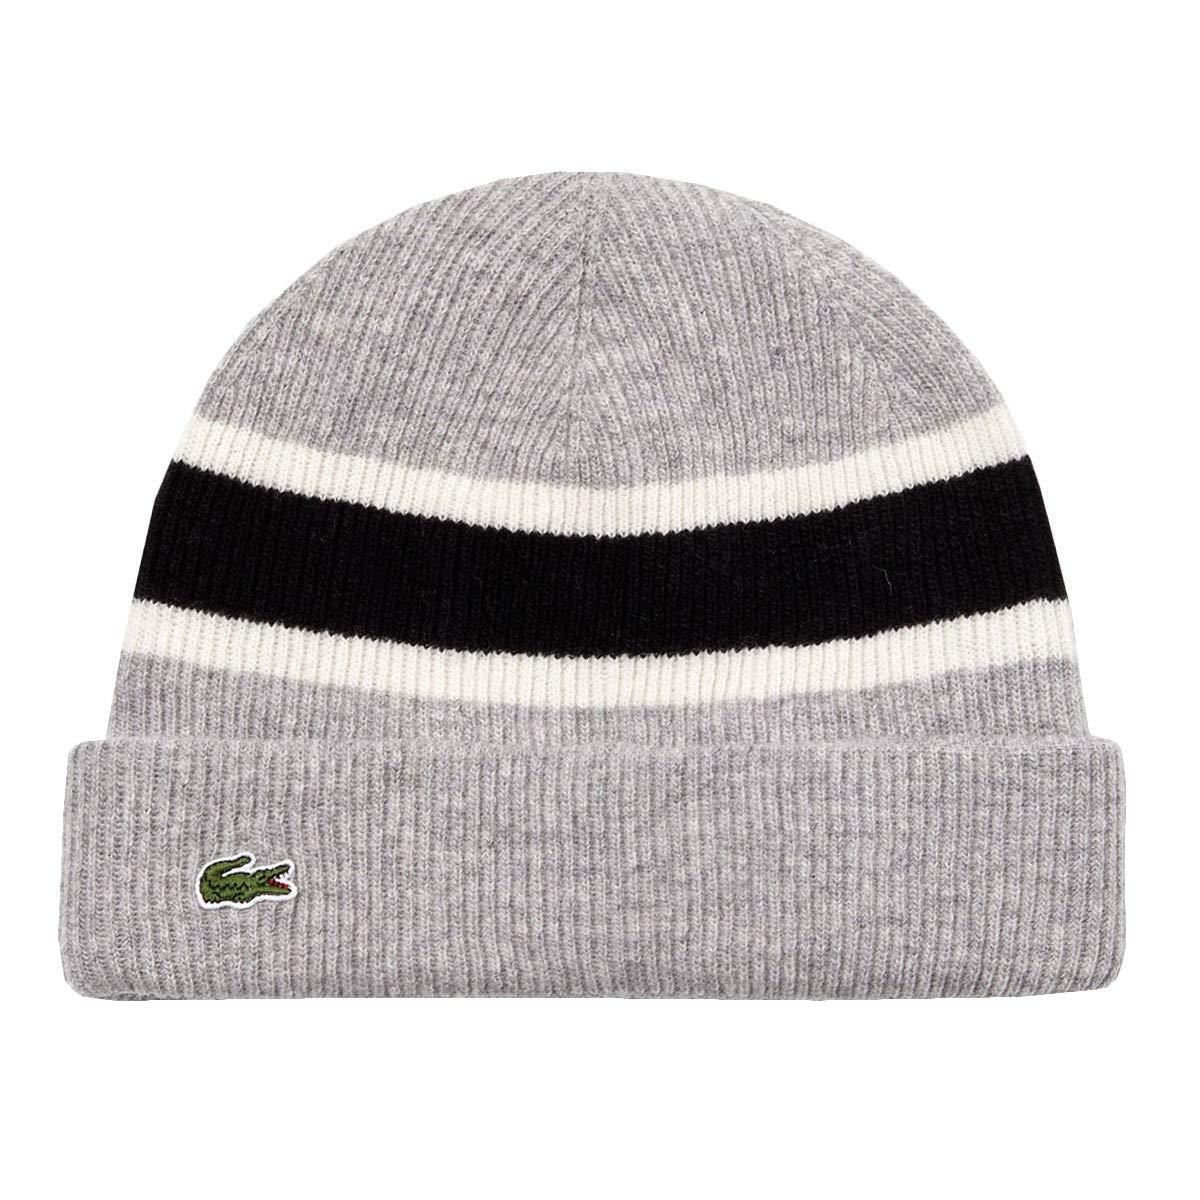 Lacoste Rb8922 Cappelli A Maglia